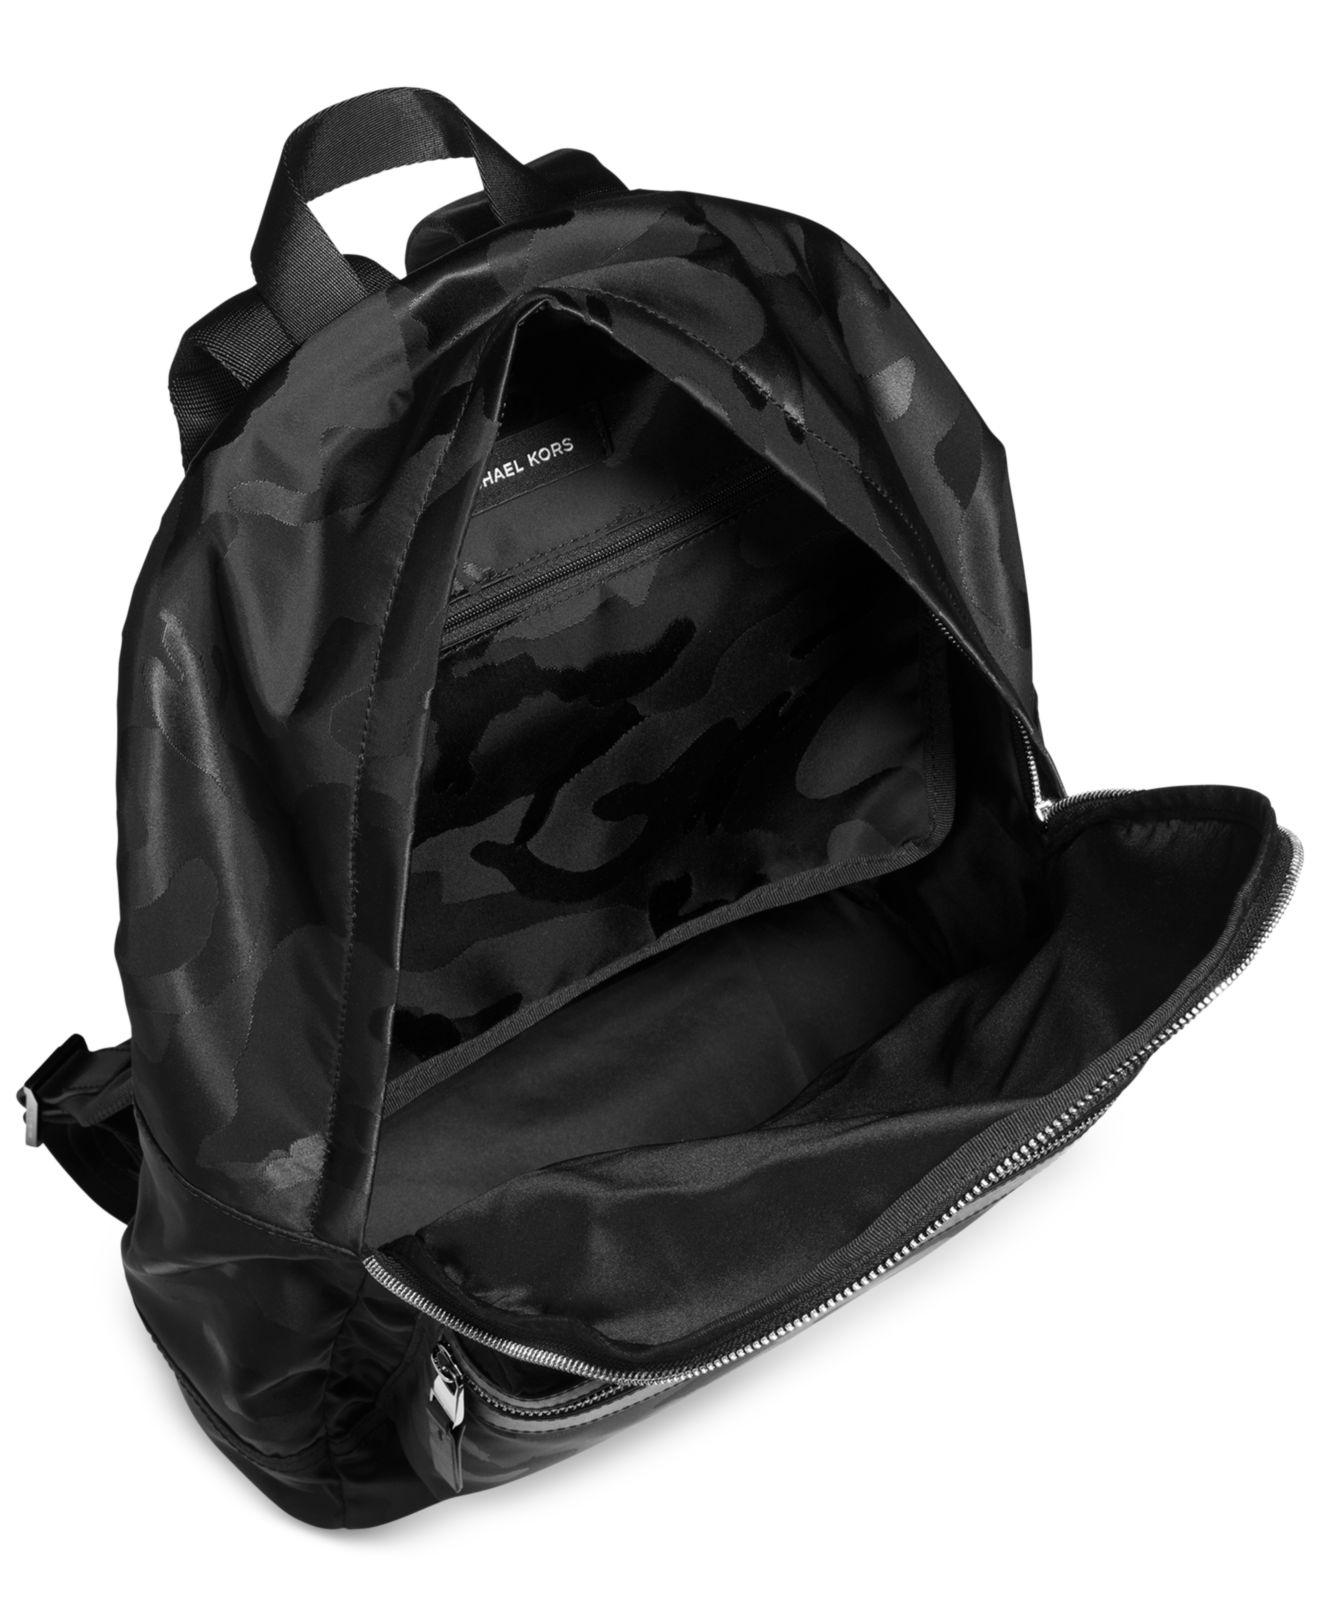 e918fcc9e4dd ... sweden michael kors mens kent camouflage backpack 17062 85691